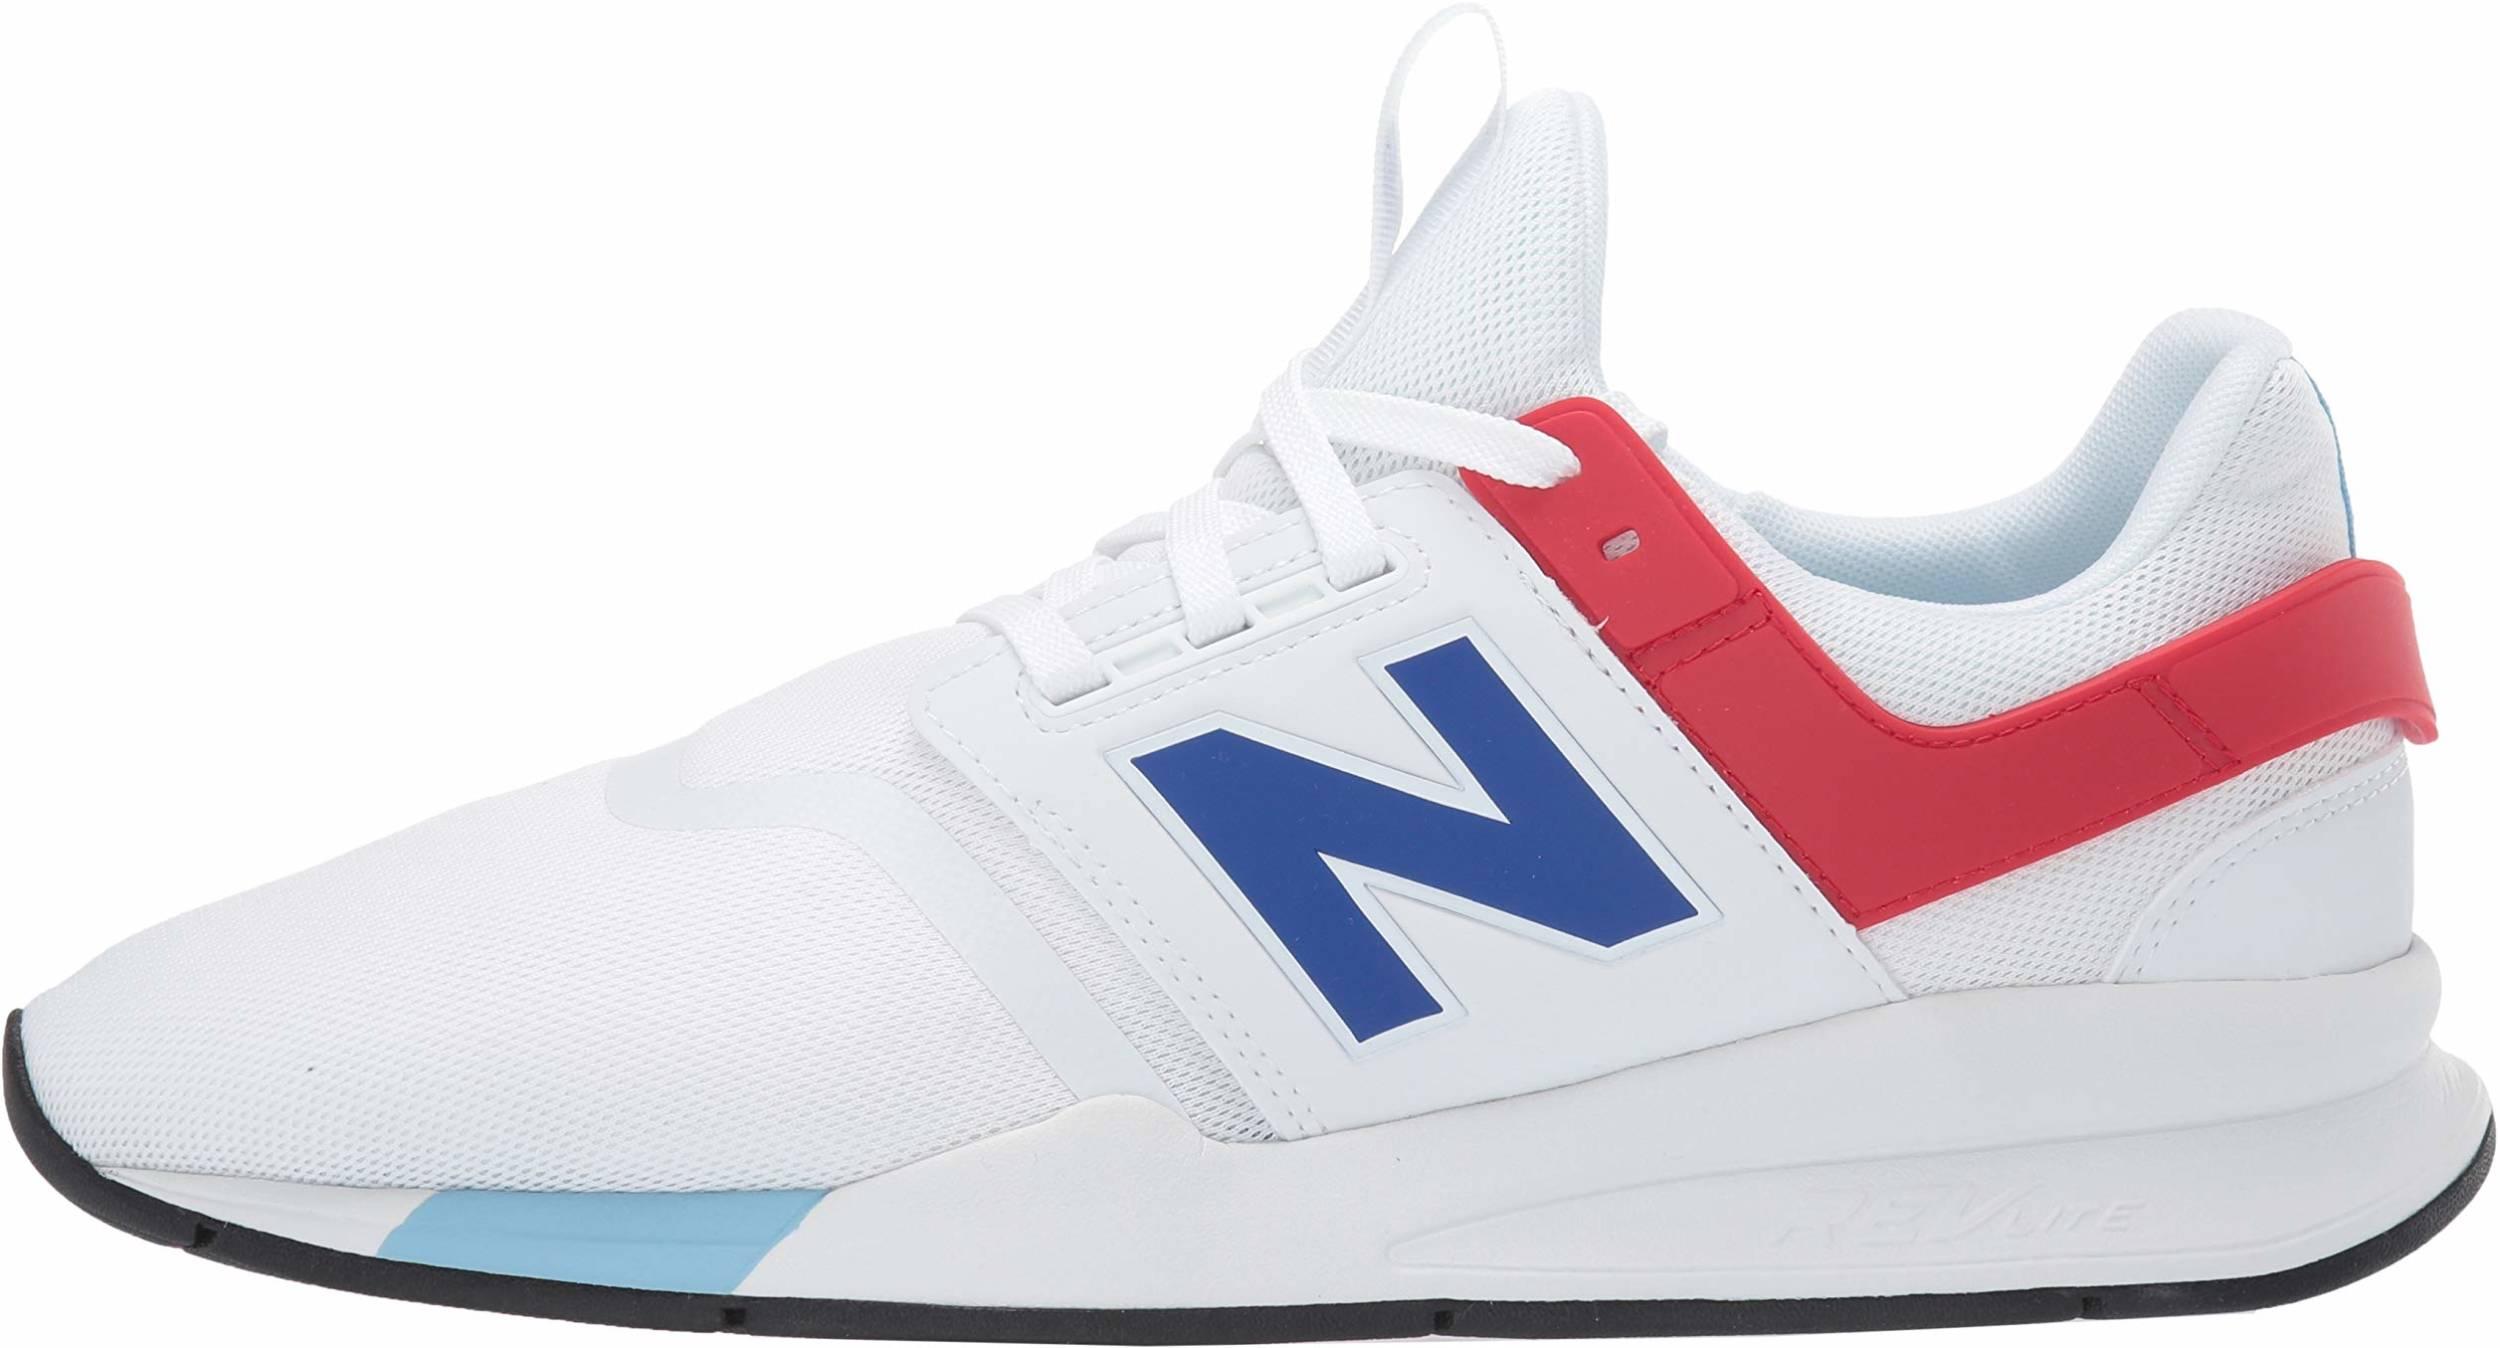 10 New Balance 247 sneakers - Save 46% | RunRepeat